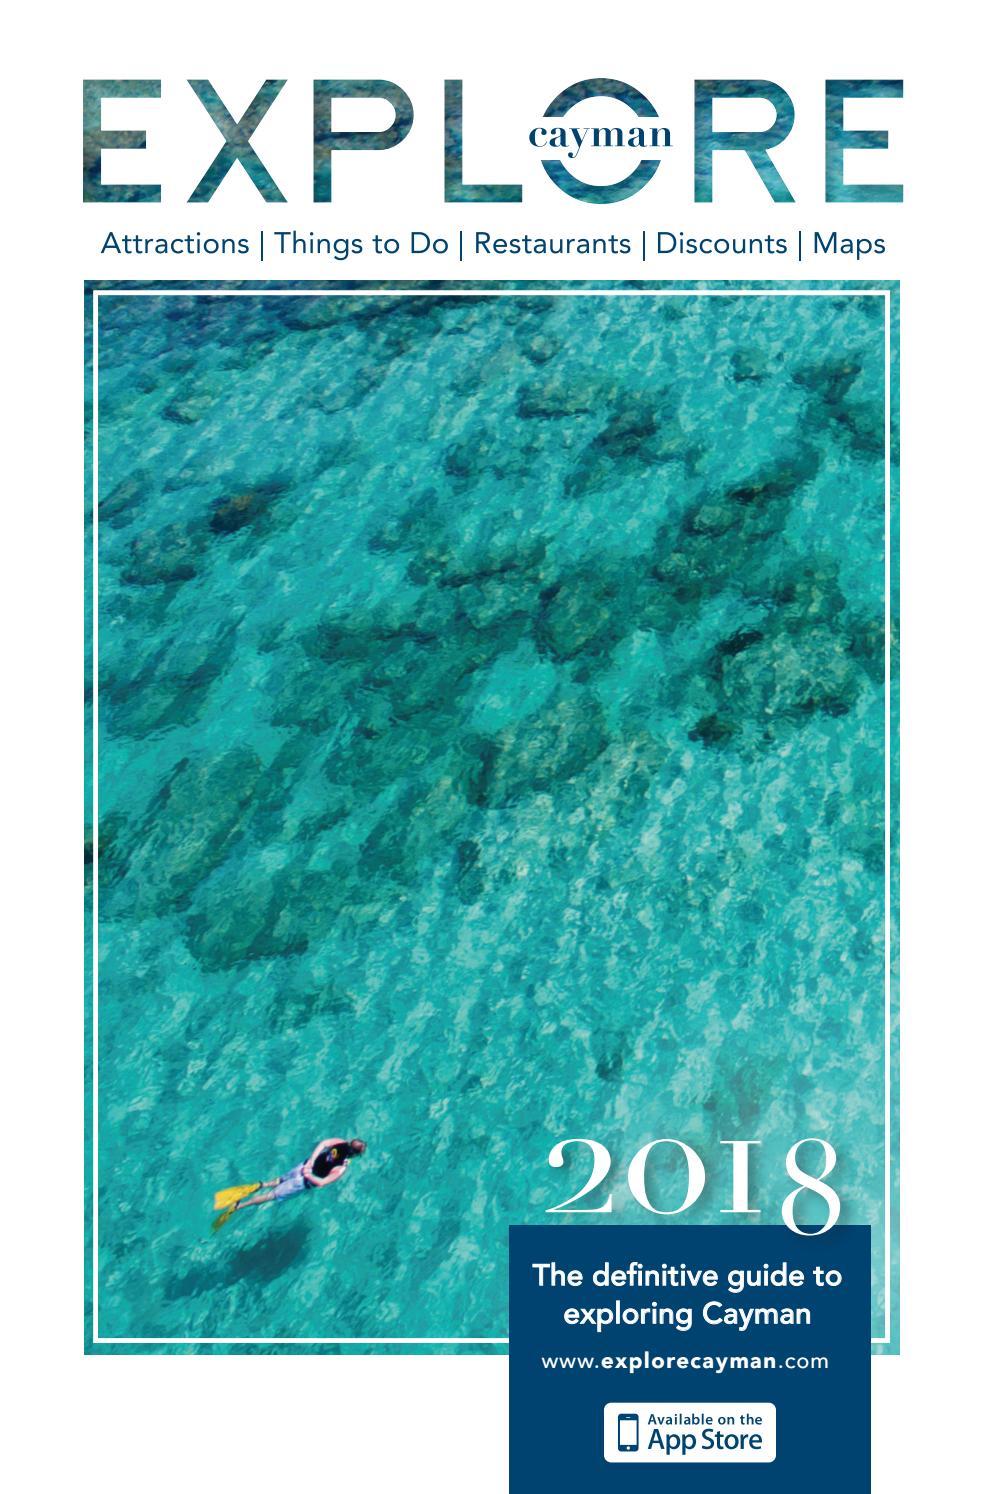 Explore Cayman 2018 By Parent Issuu Snap Circuits 300 Project Kit Shop Atjm Cremps Adventure Store